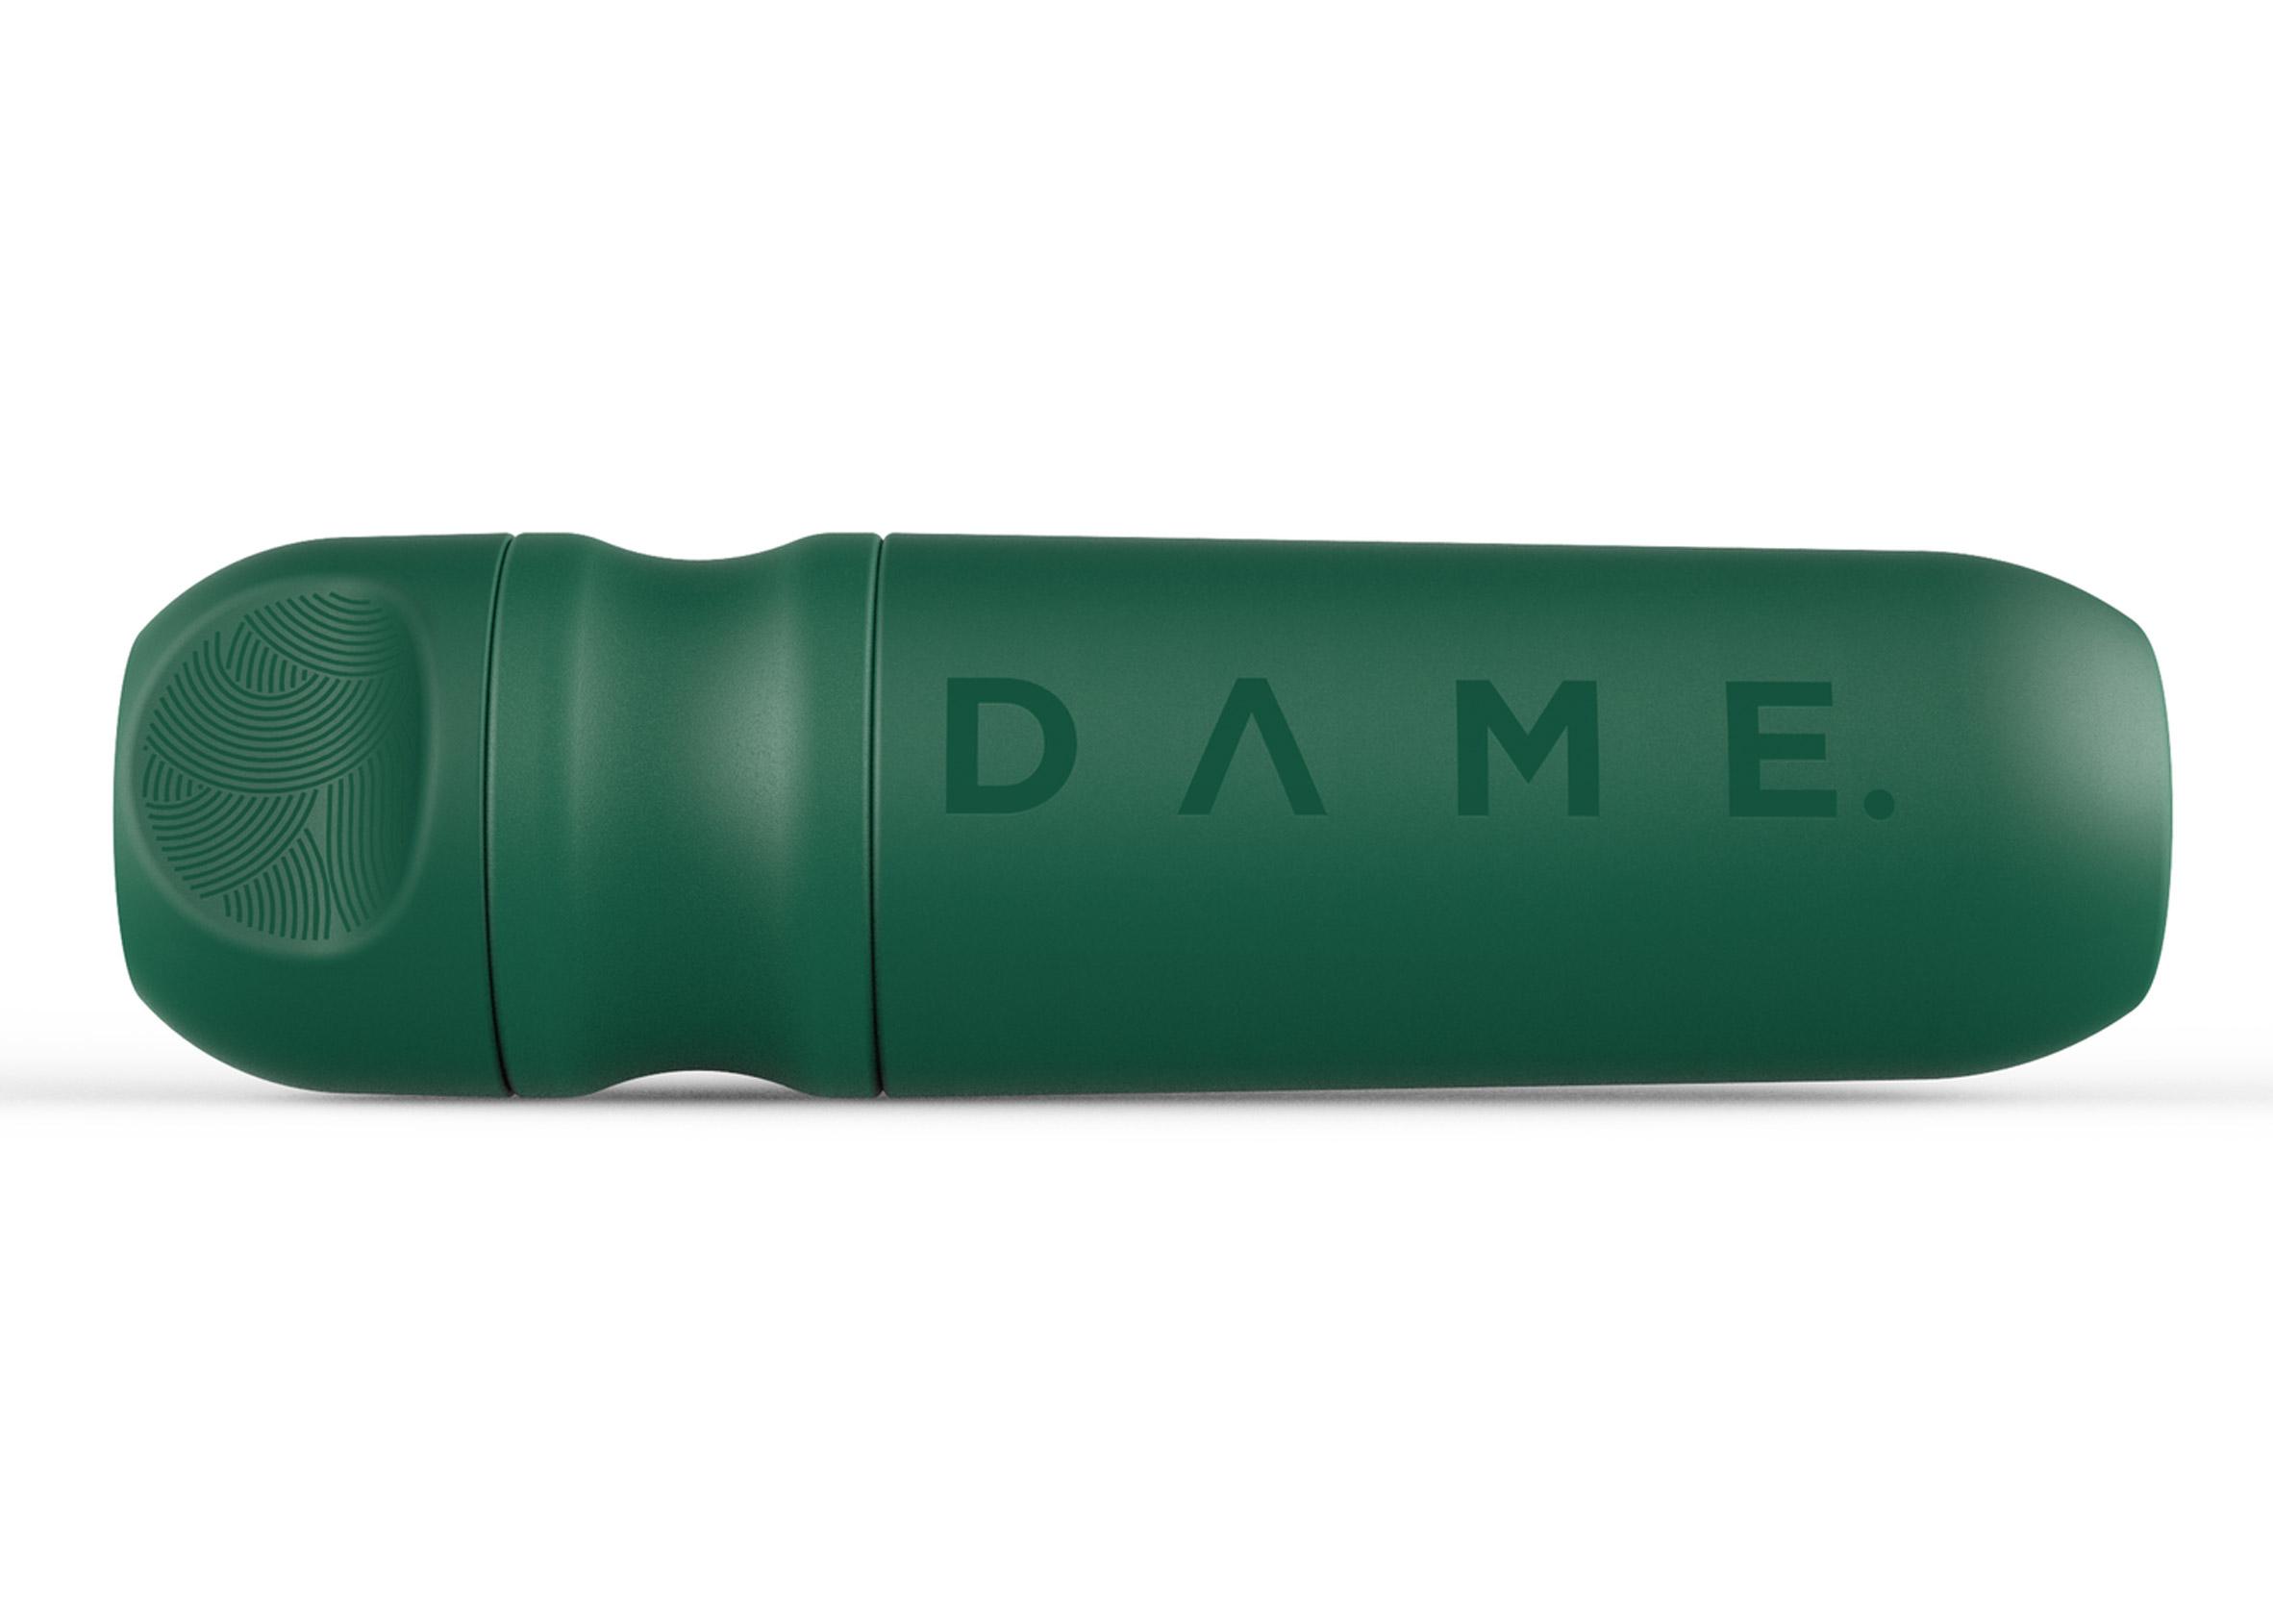 Dezeen Awards design winners: D Reusable Tampon Applicator and Organic Tampons by DAME